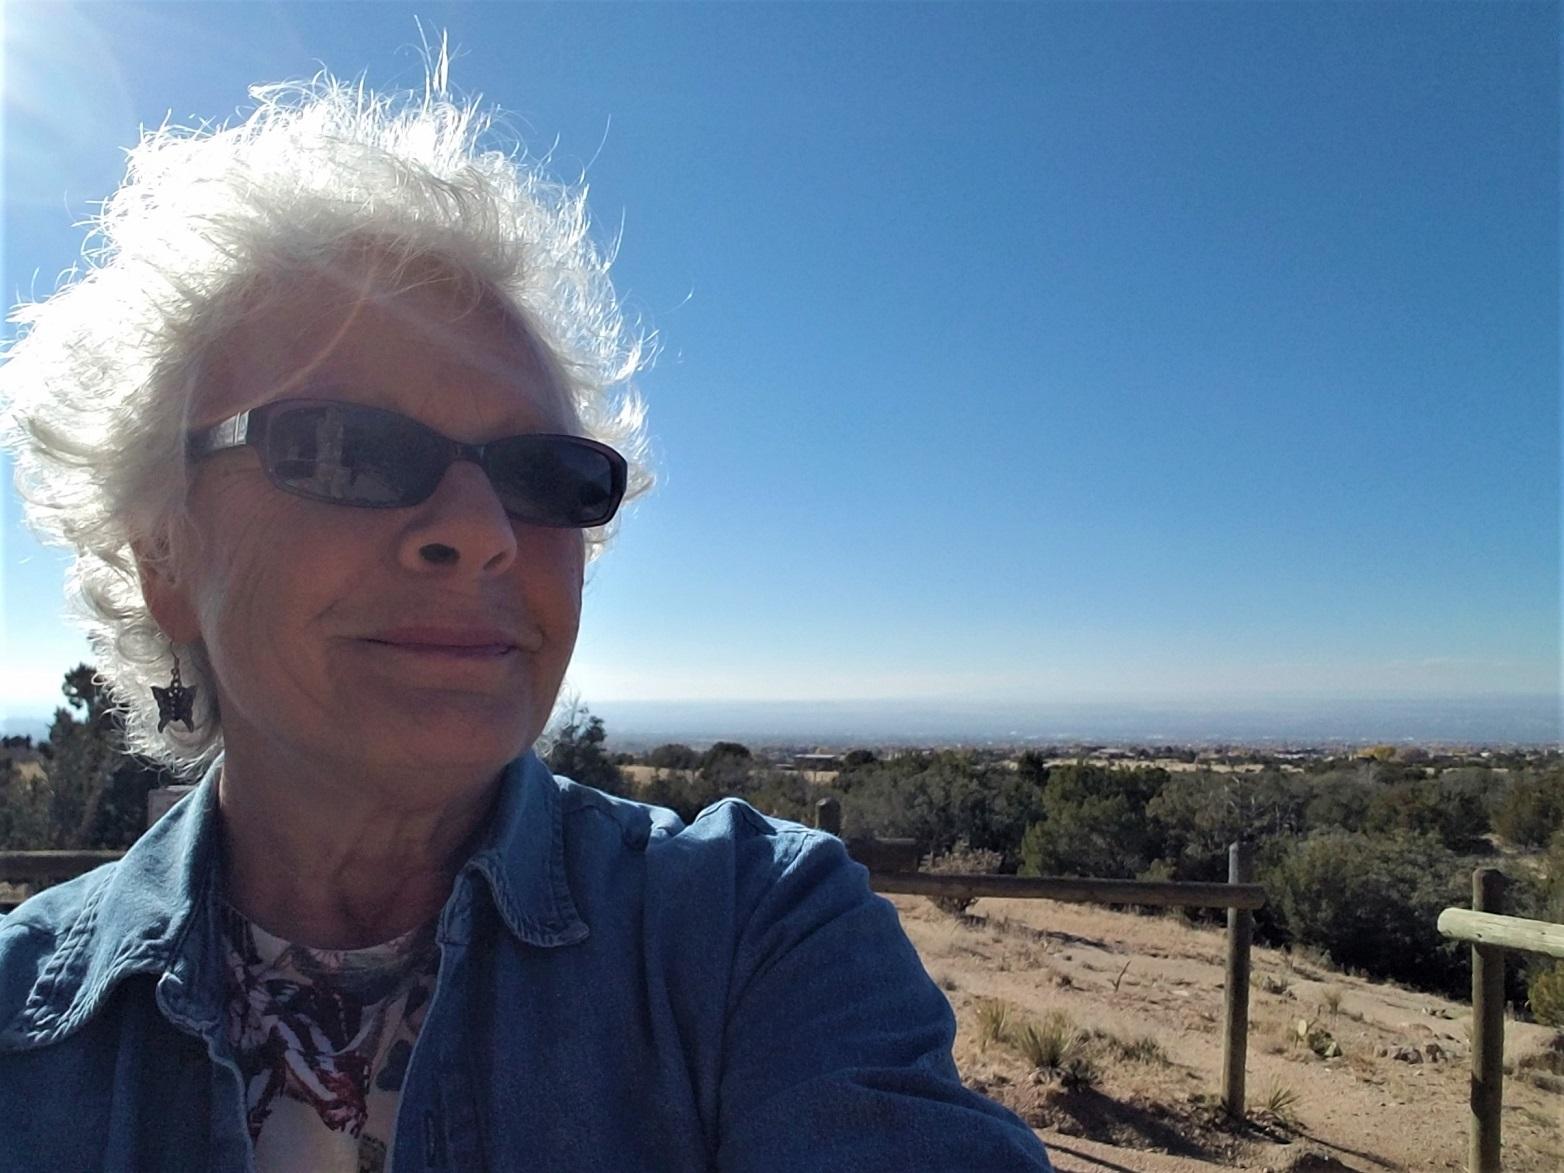 My last visit to Elana Gallegos picnic area in the Sandia Mtns.